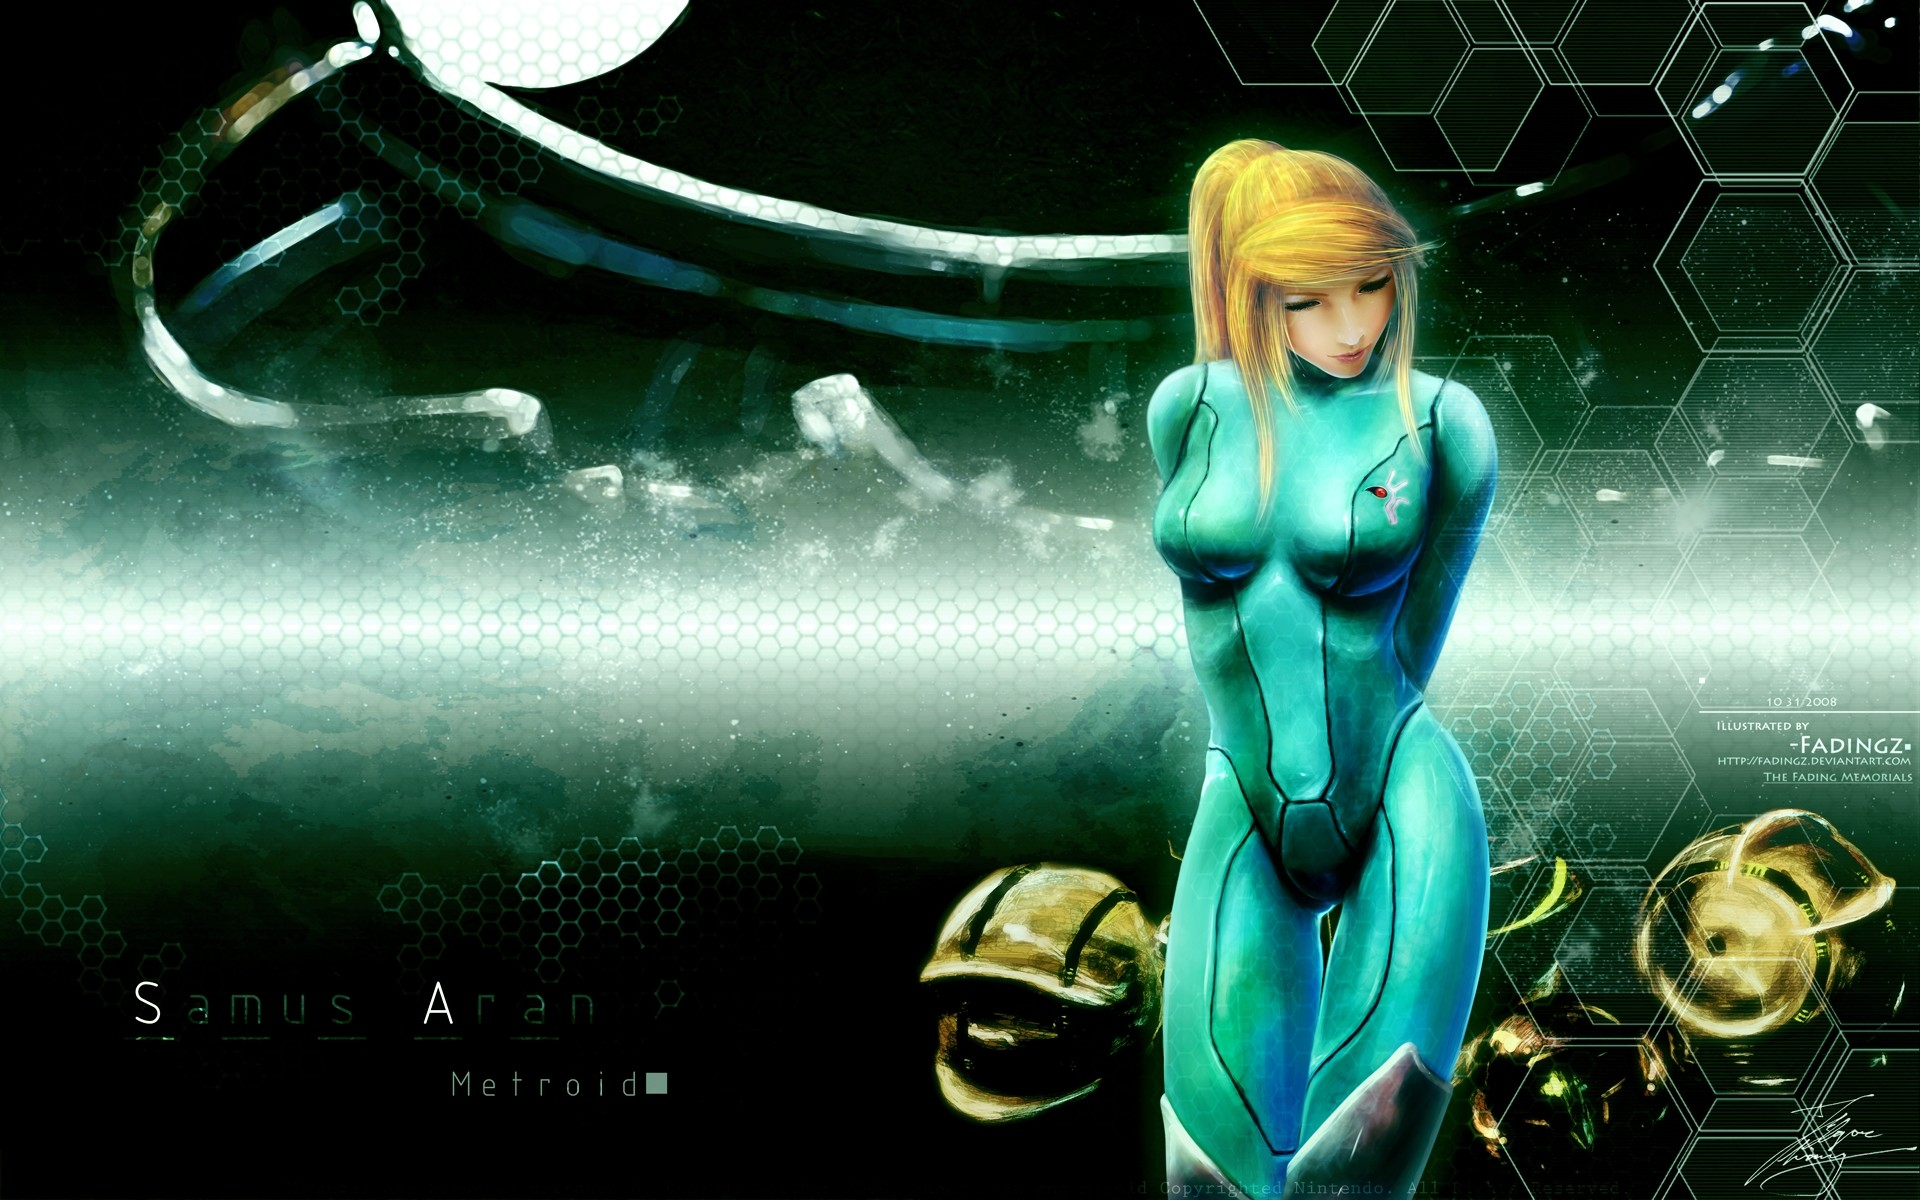 Tags: Anime, Fadingz, Metroid, Samus Aran, Zero Suit Samus, Honeycomb